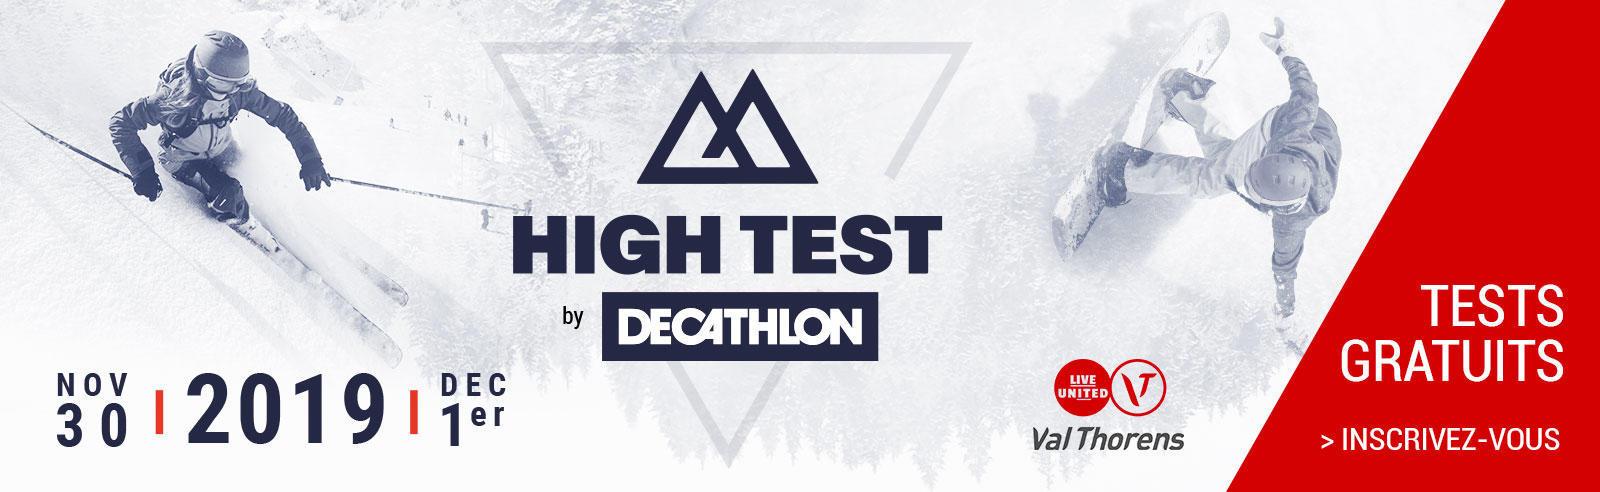 HIGH TEST